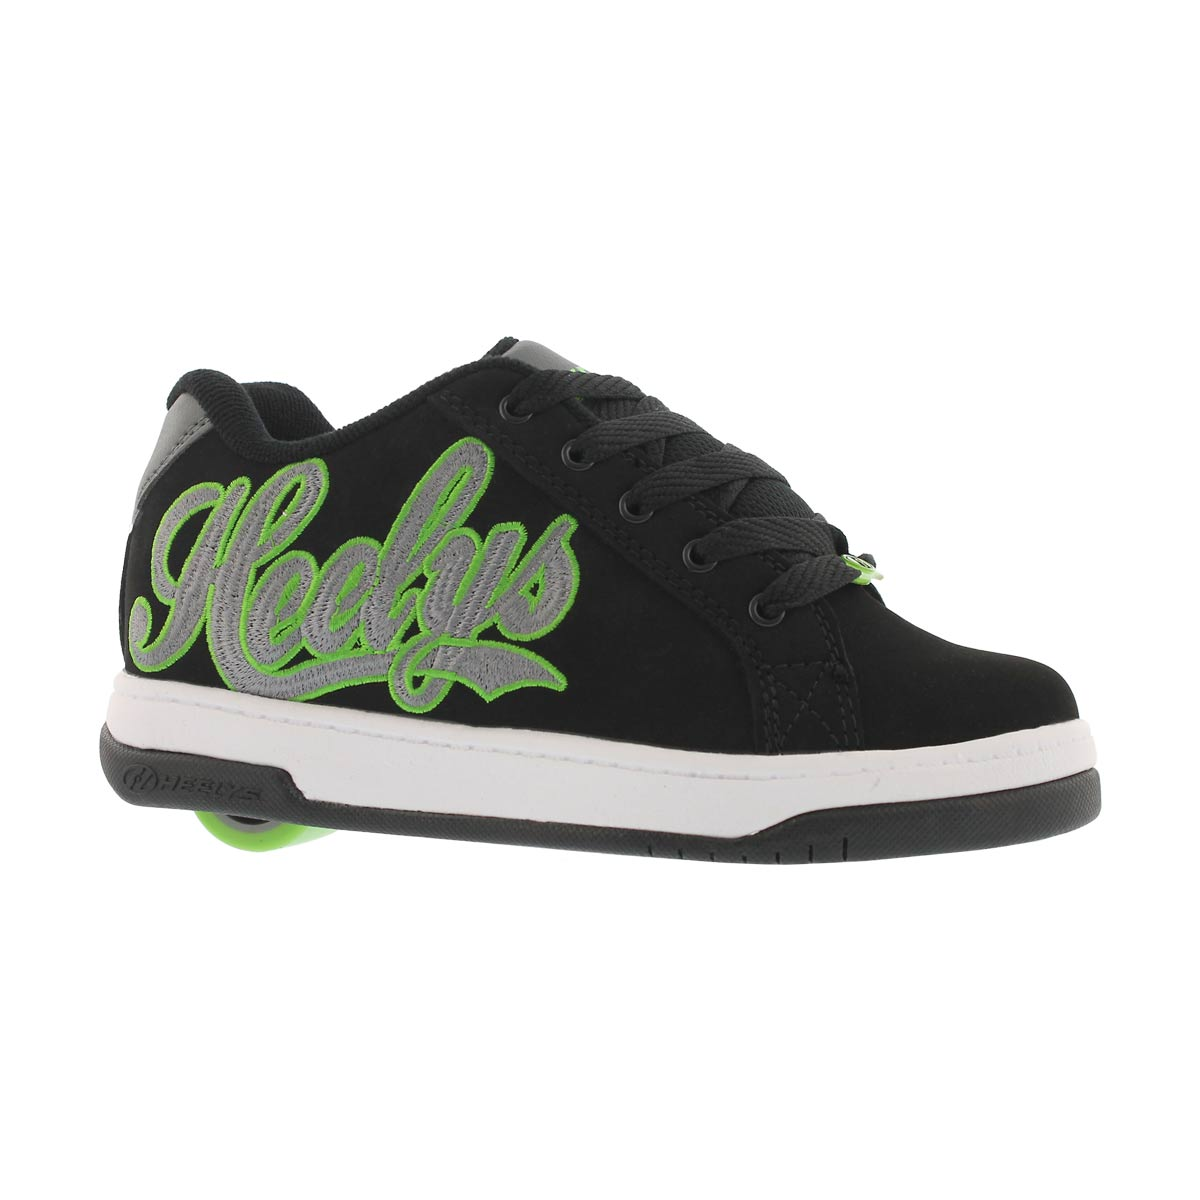 Boys' SPLIT black/charcoal /green skate sneakers